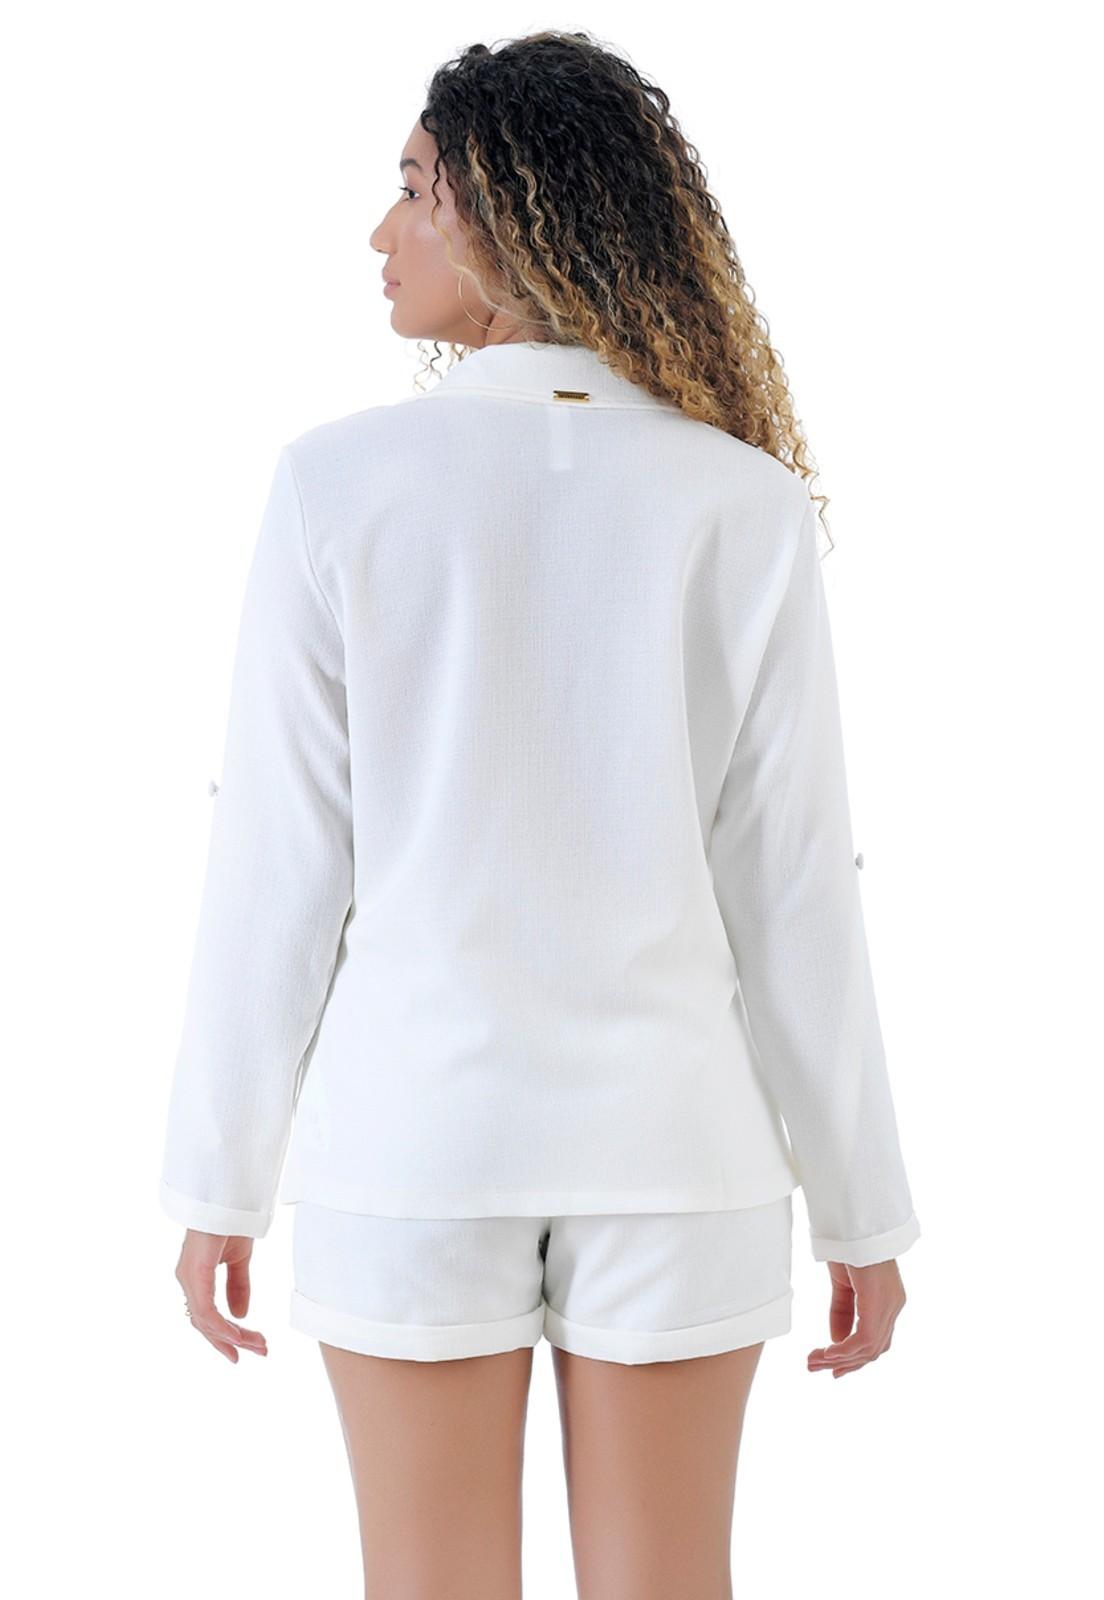 Conjunto branco Gatabakana